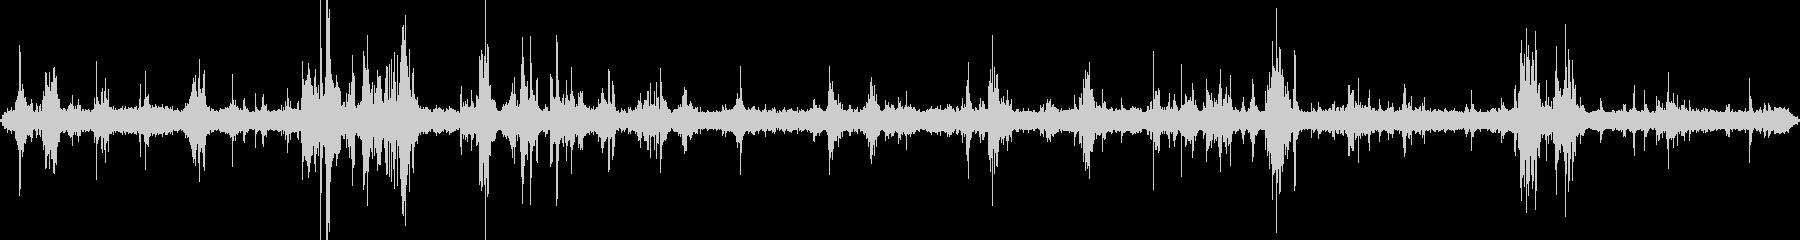 [ASMR] 風鈴とカエル_03の未再生の波形